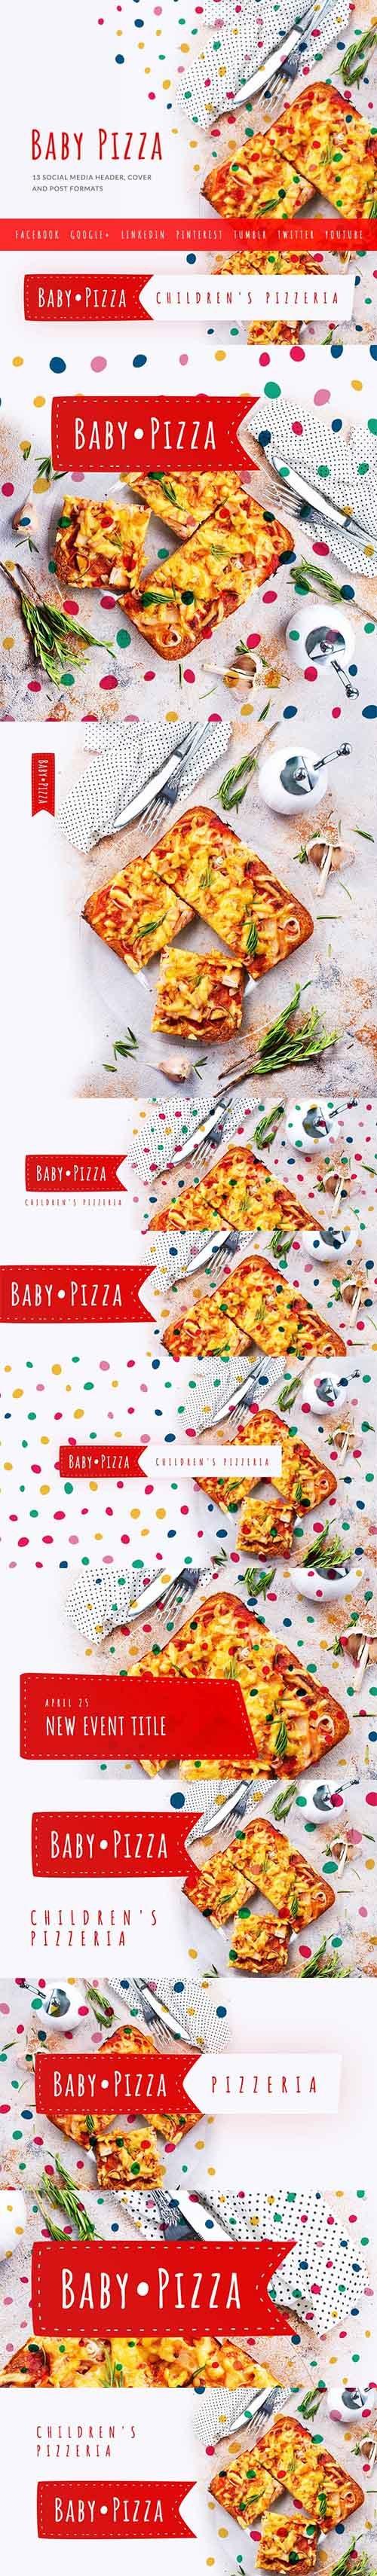 Baby Pizzeria - Social Media Kit